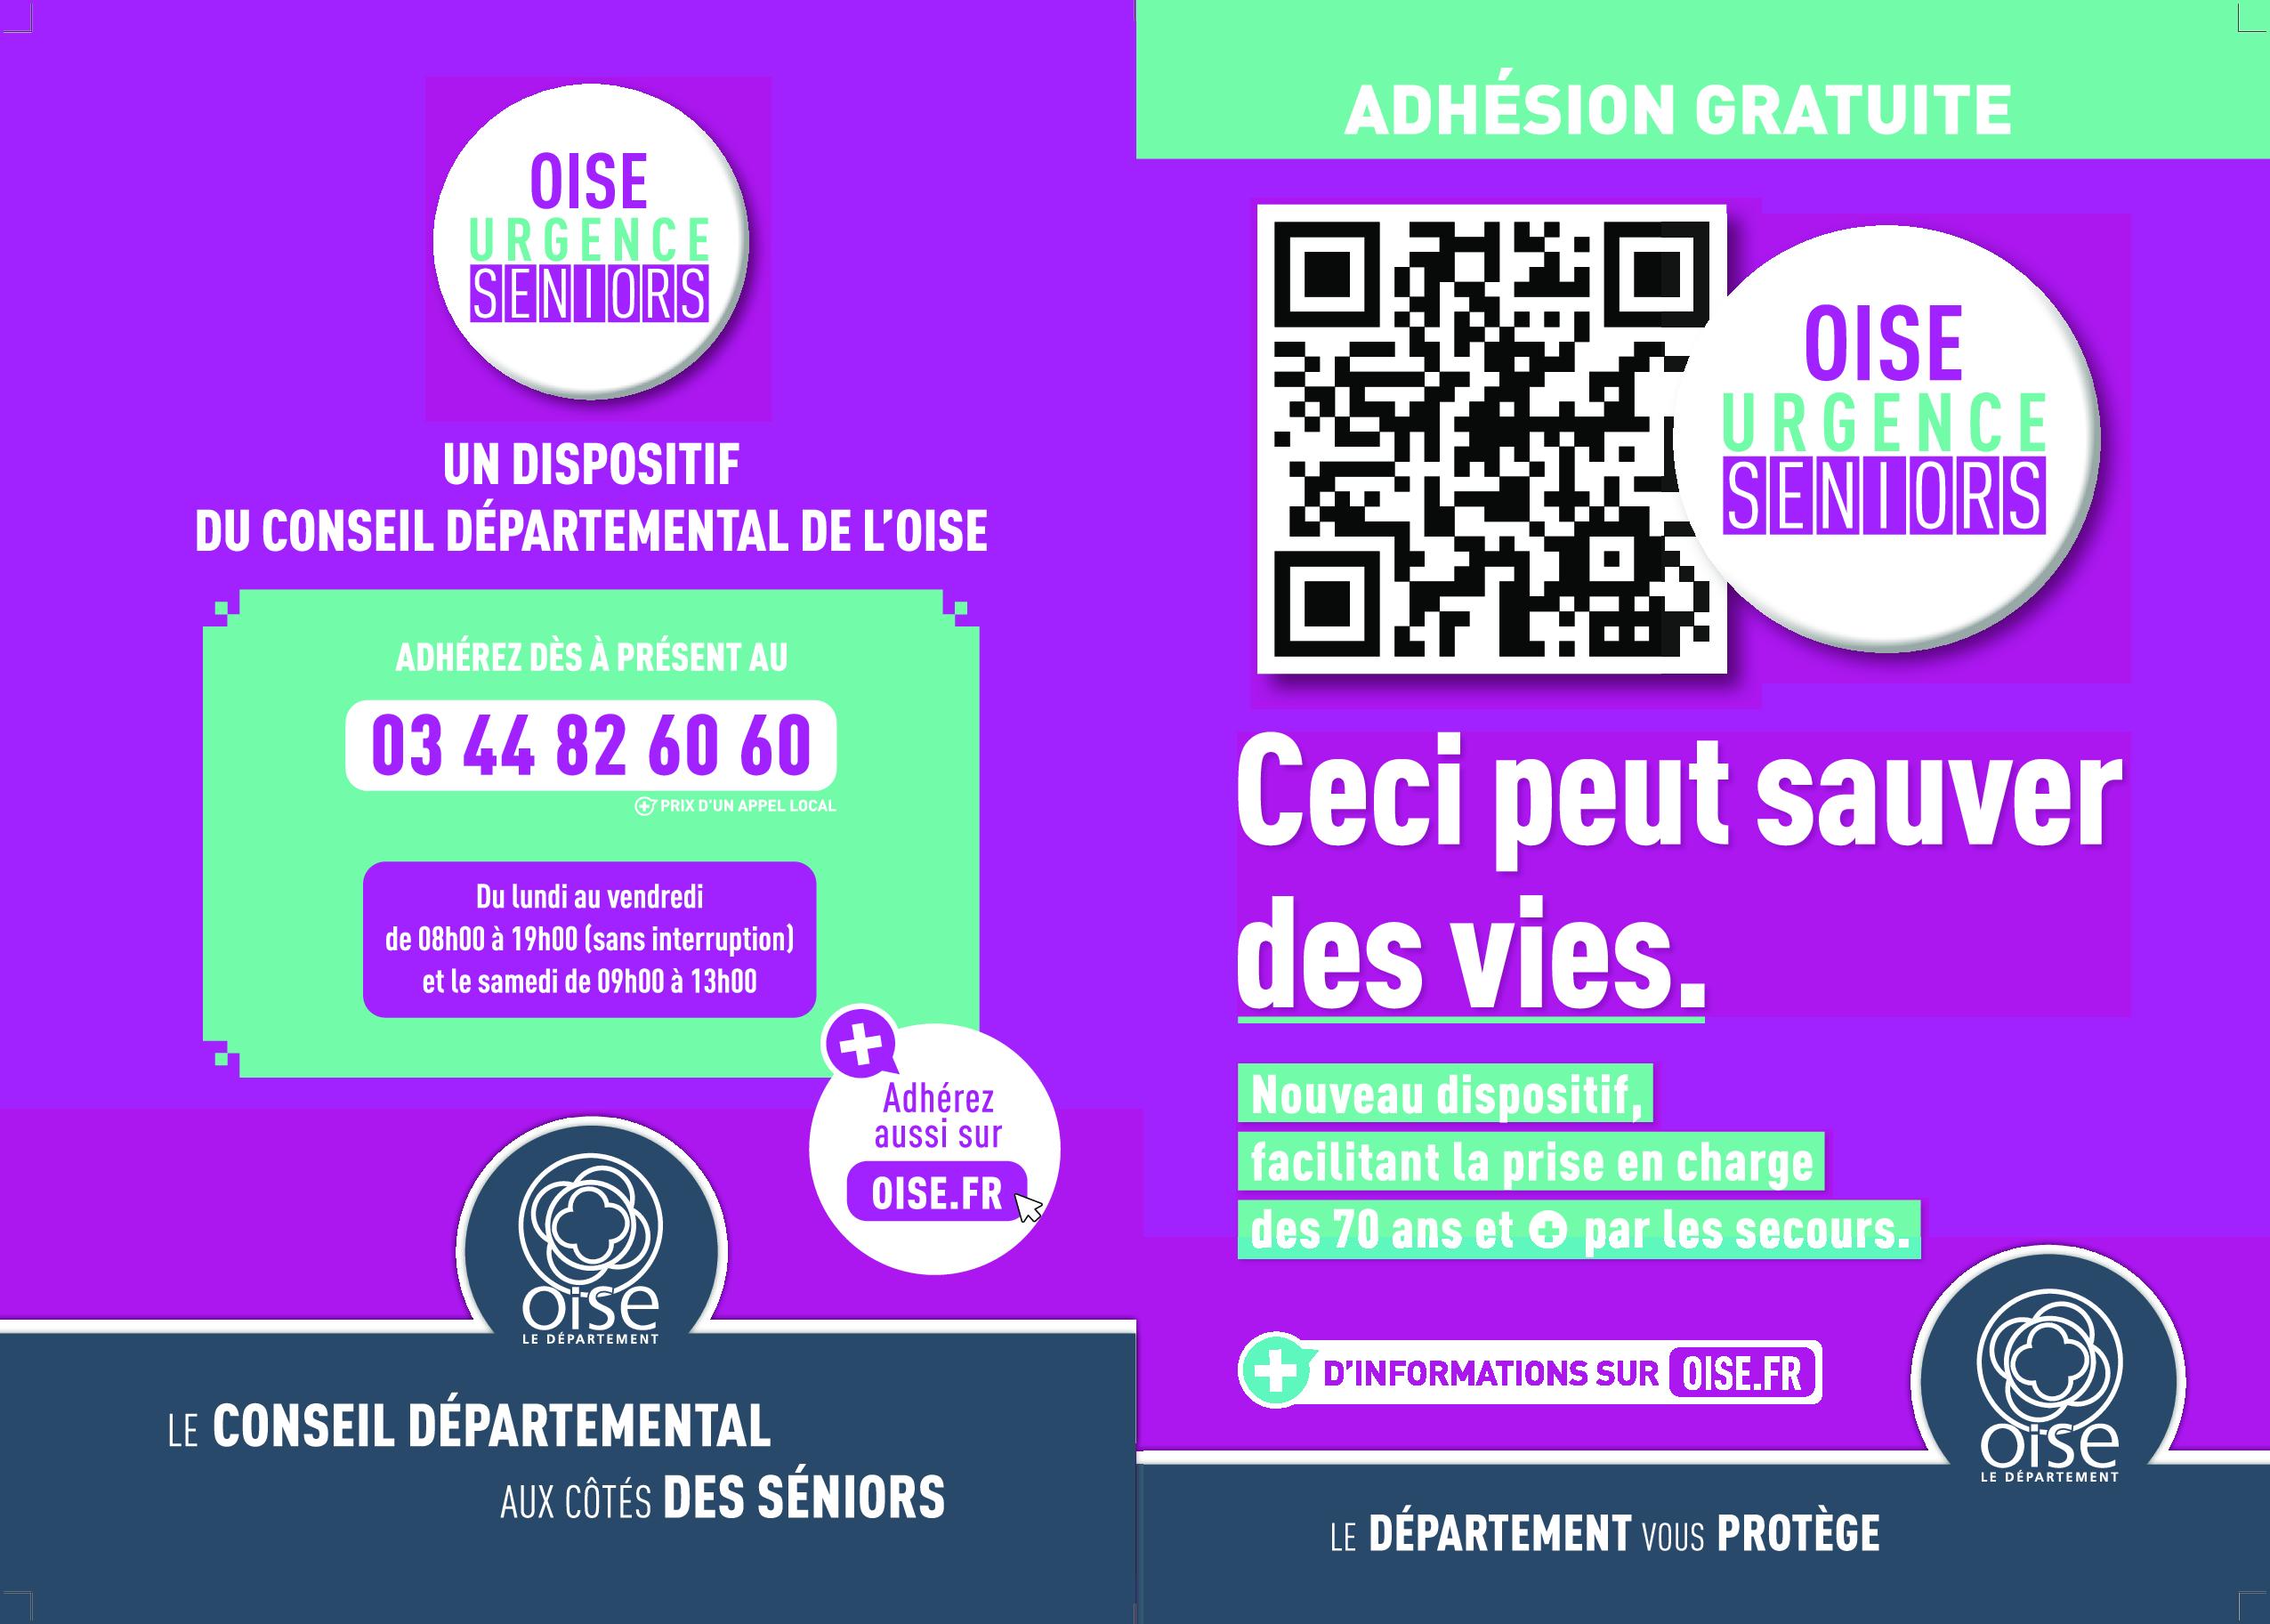 Flyer-Oise urgence seniors-2020-A4-2volets-ech1_IMPRESSION_HD_001.png